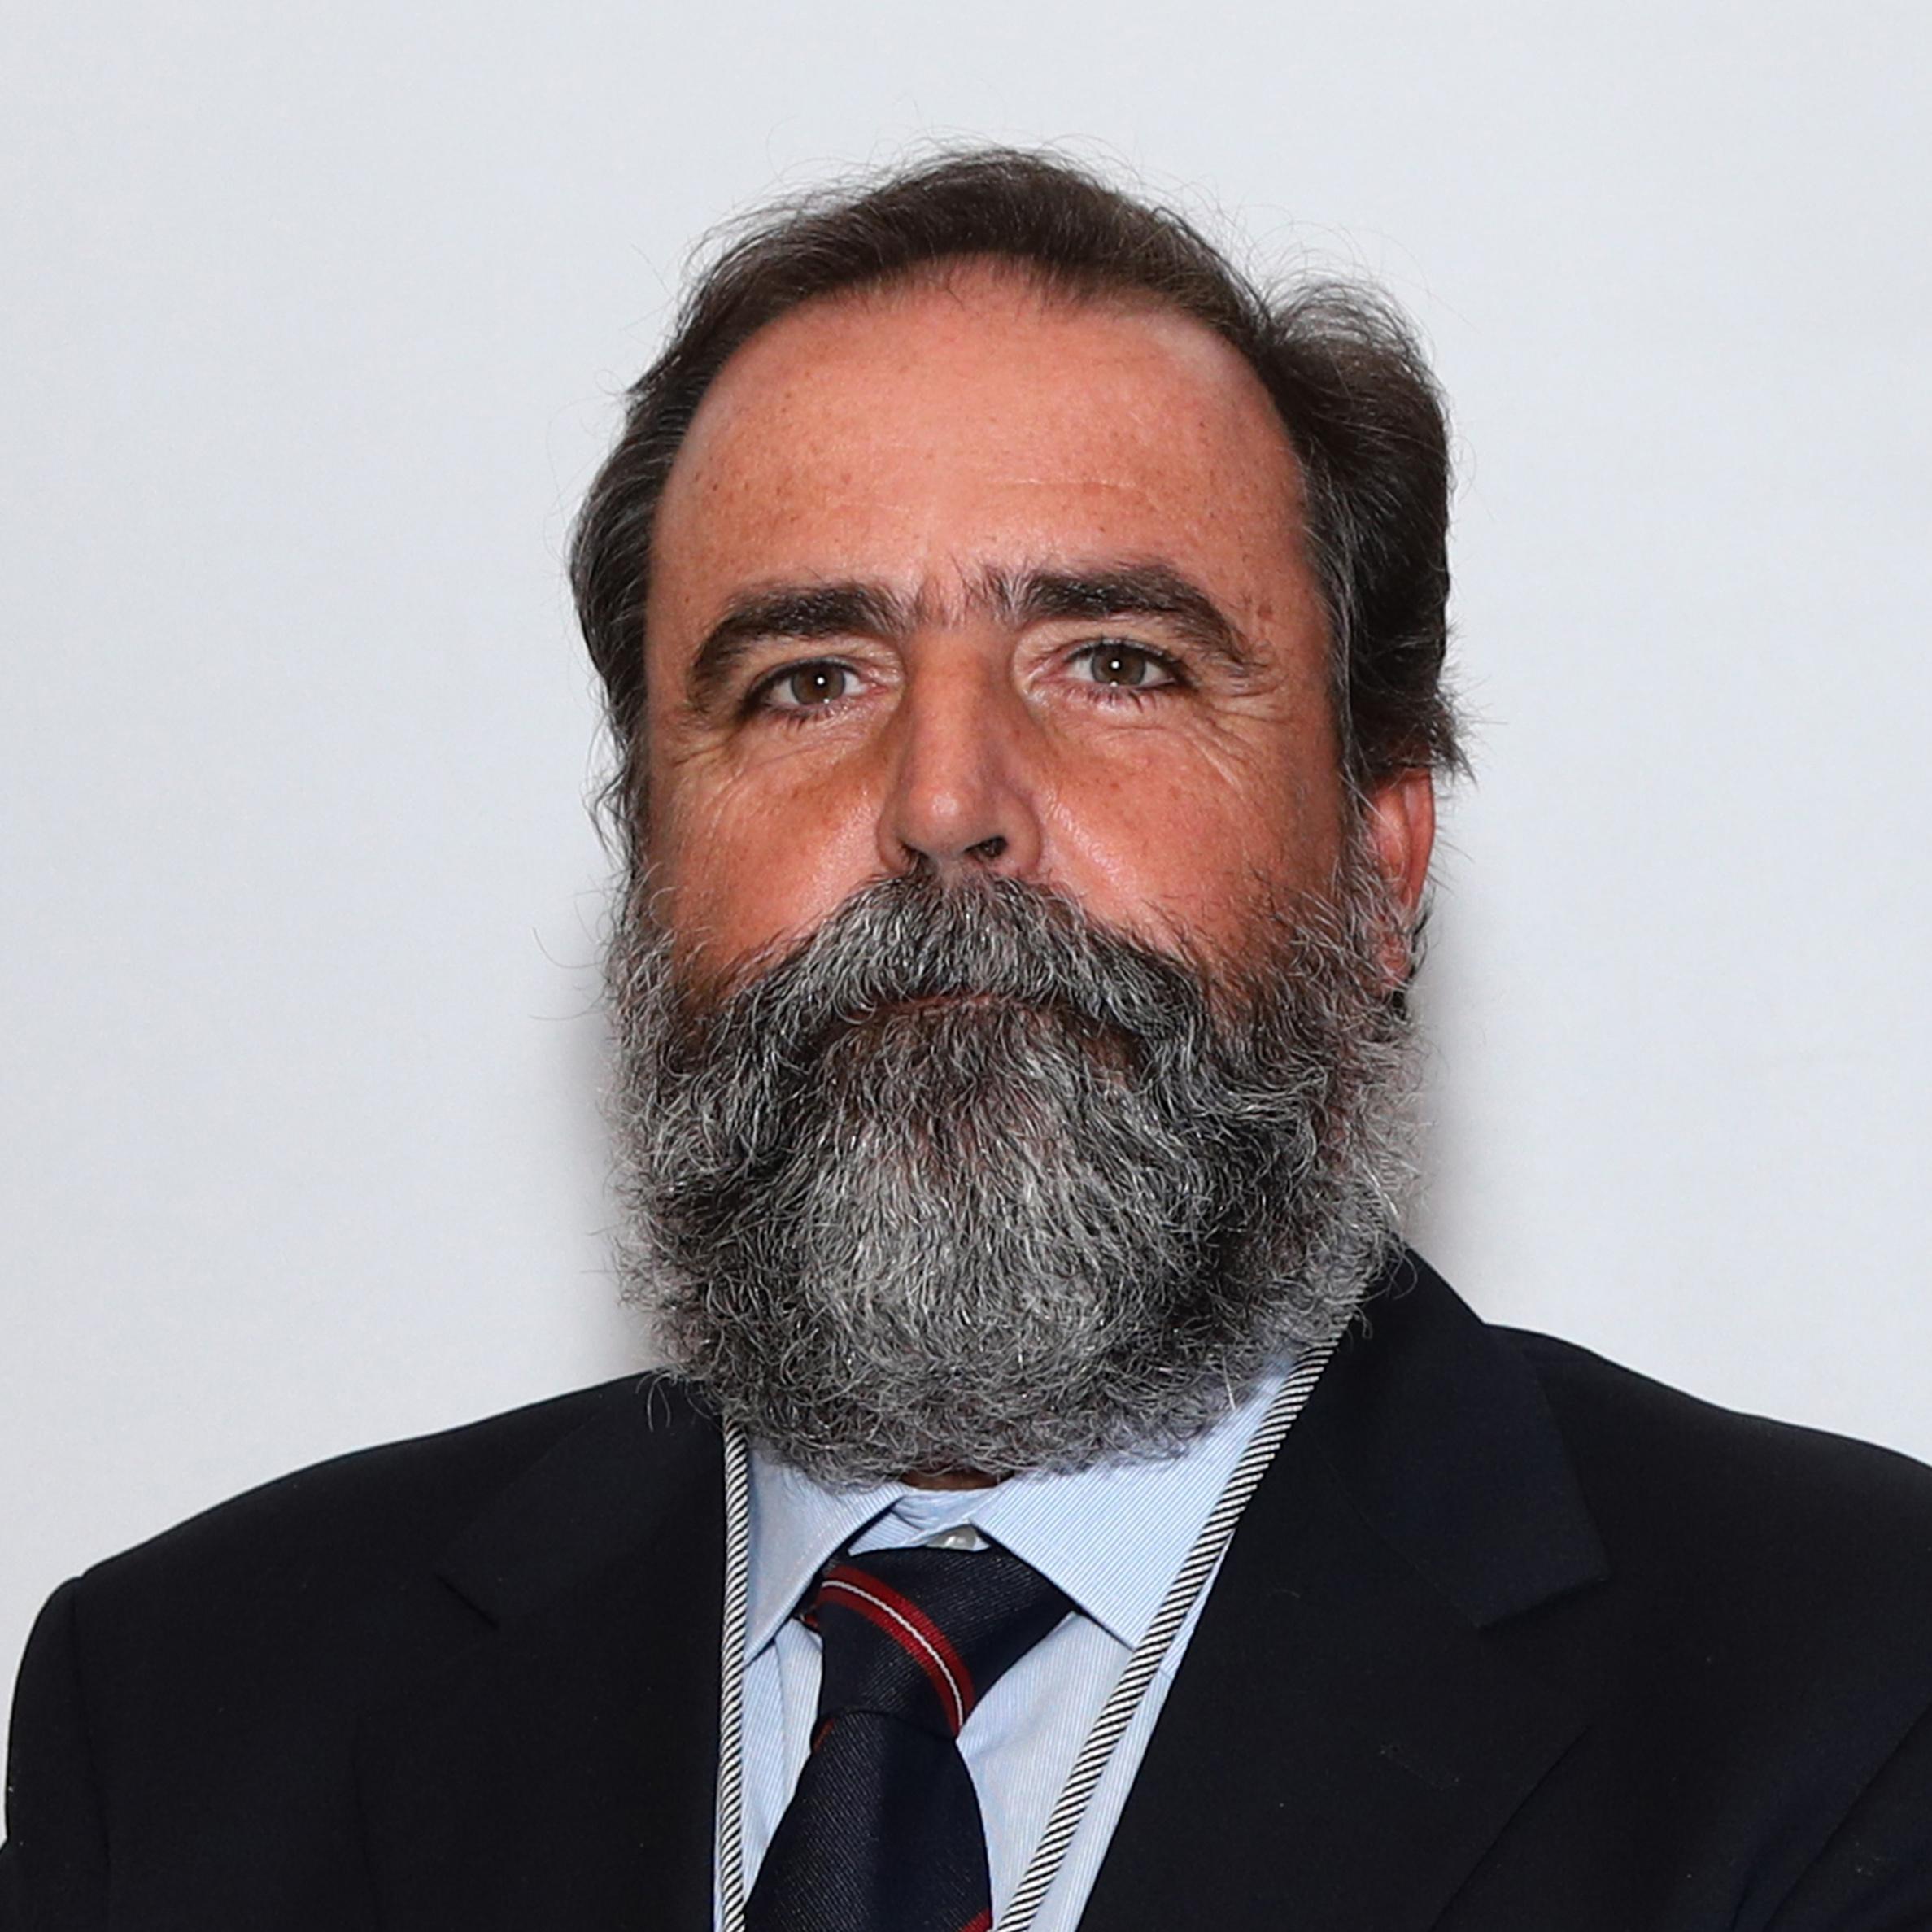 Luis Filipe Braga